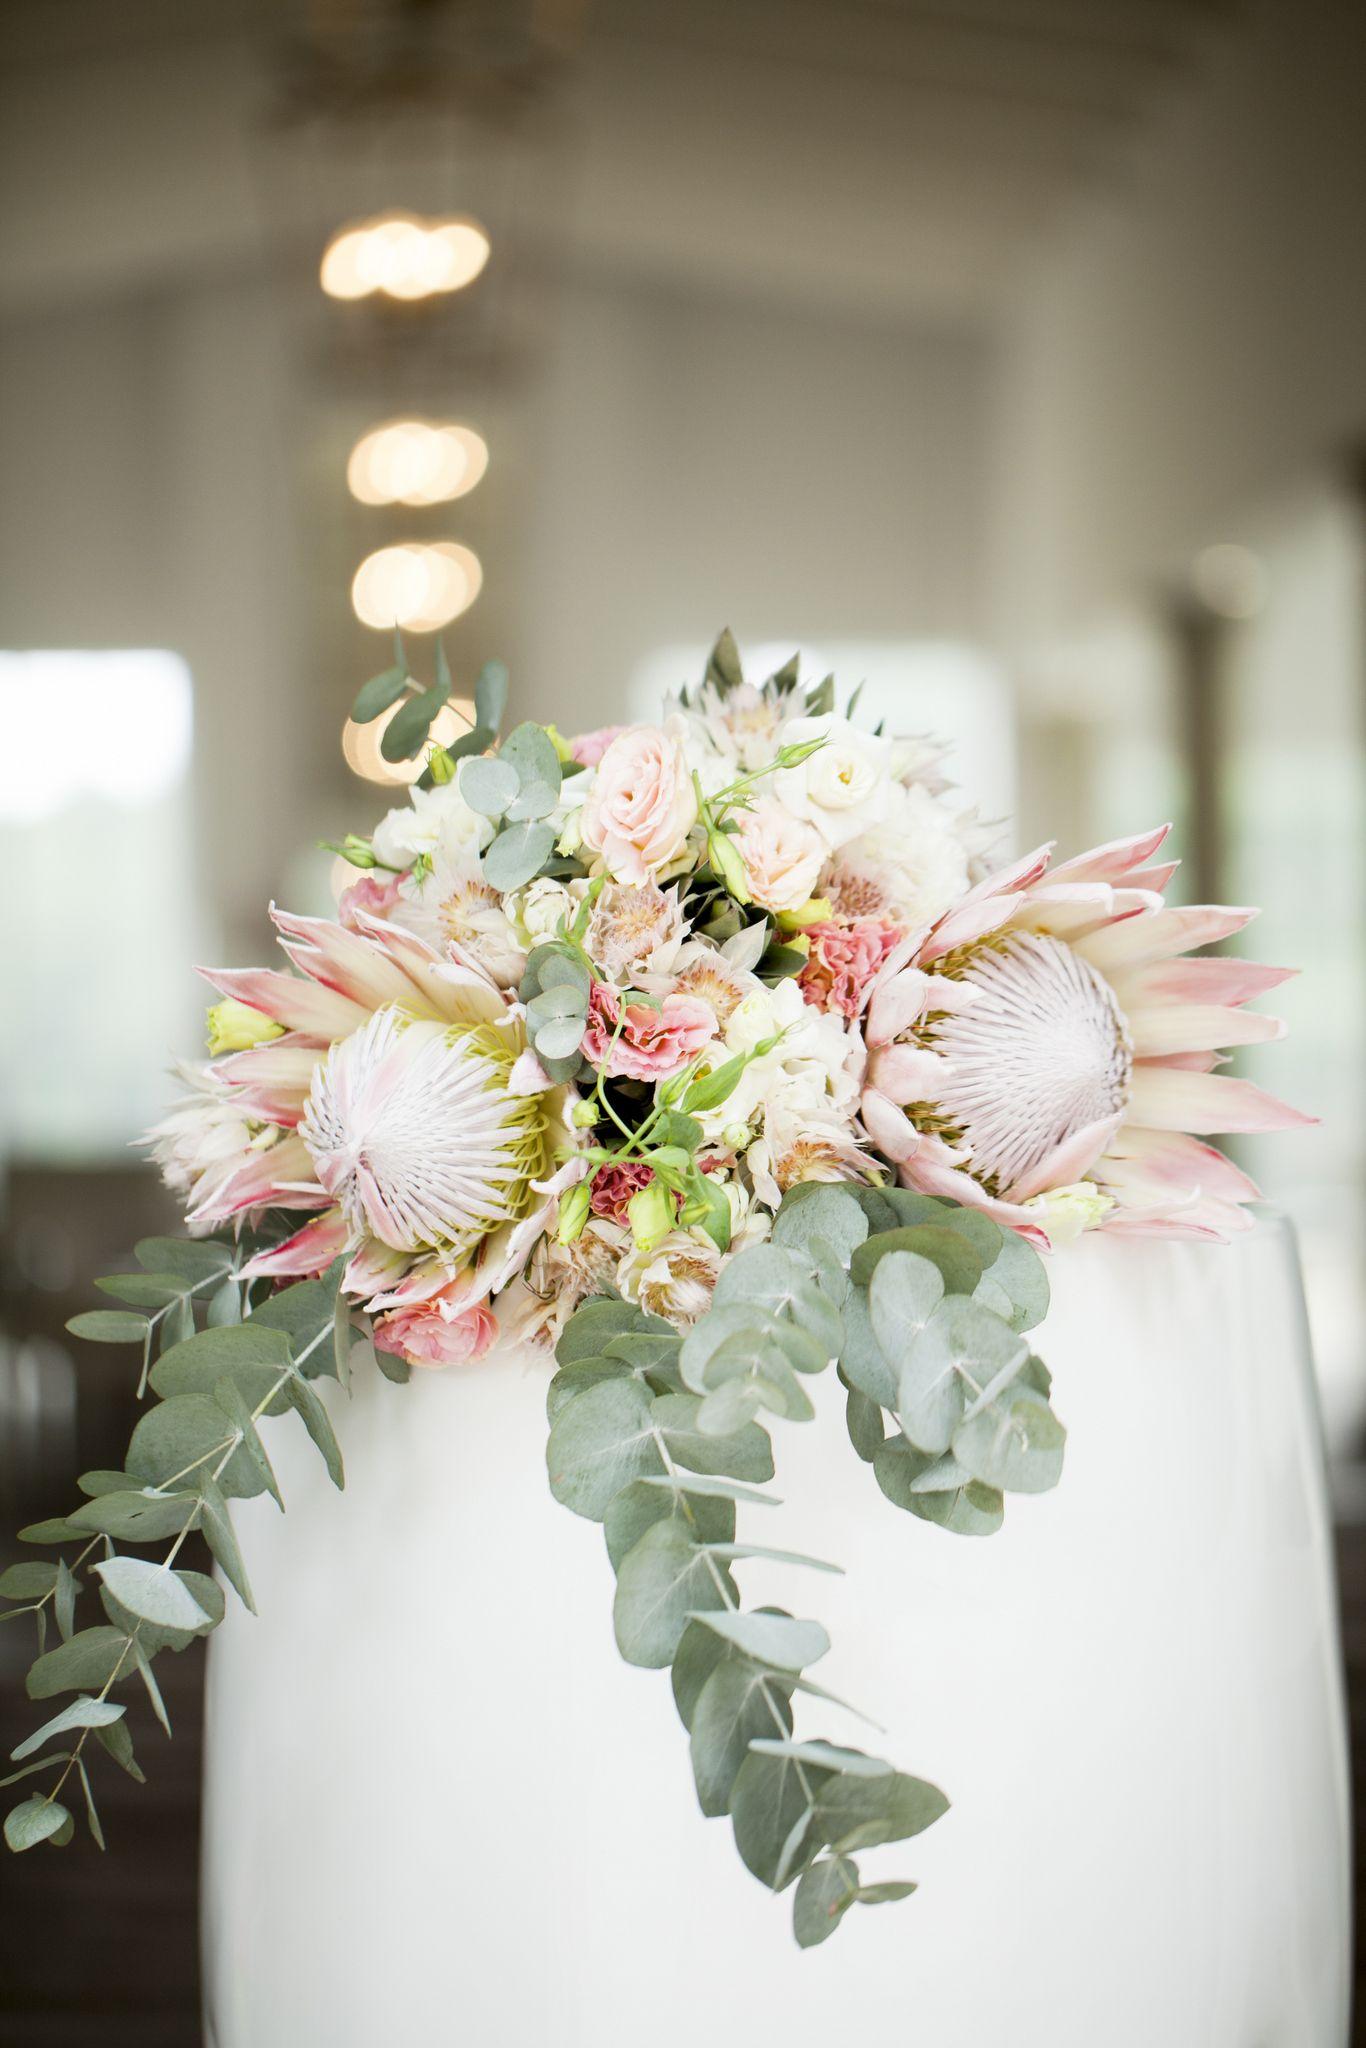 My Wedding Bouquet Protea Eucalyptus Soft Greens And Pinks Protea Wedding Wedding Bridal Bouquets Wedding Bouquets